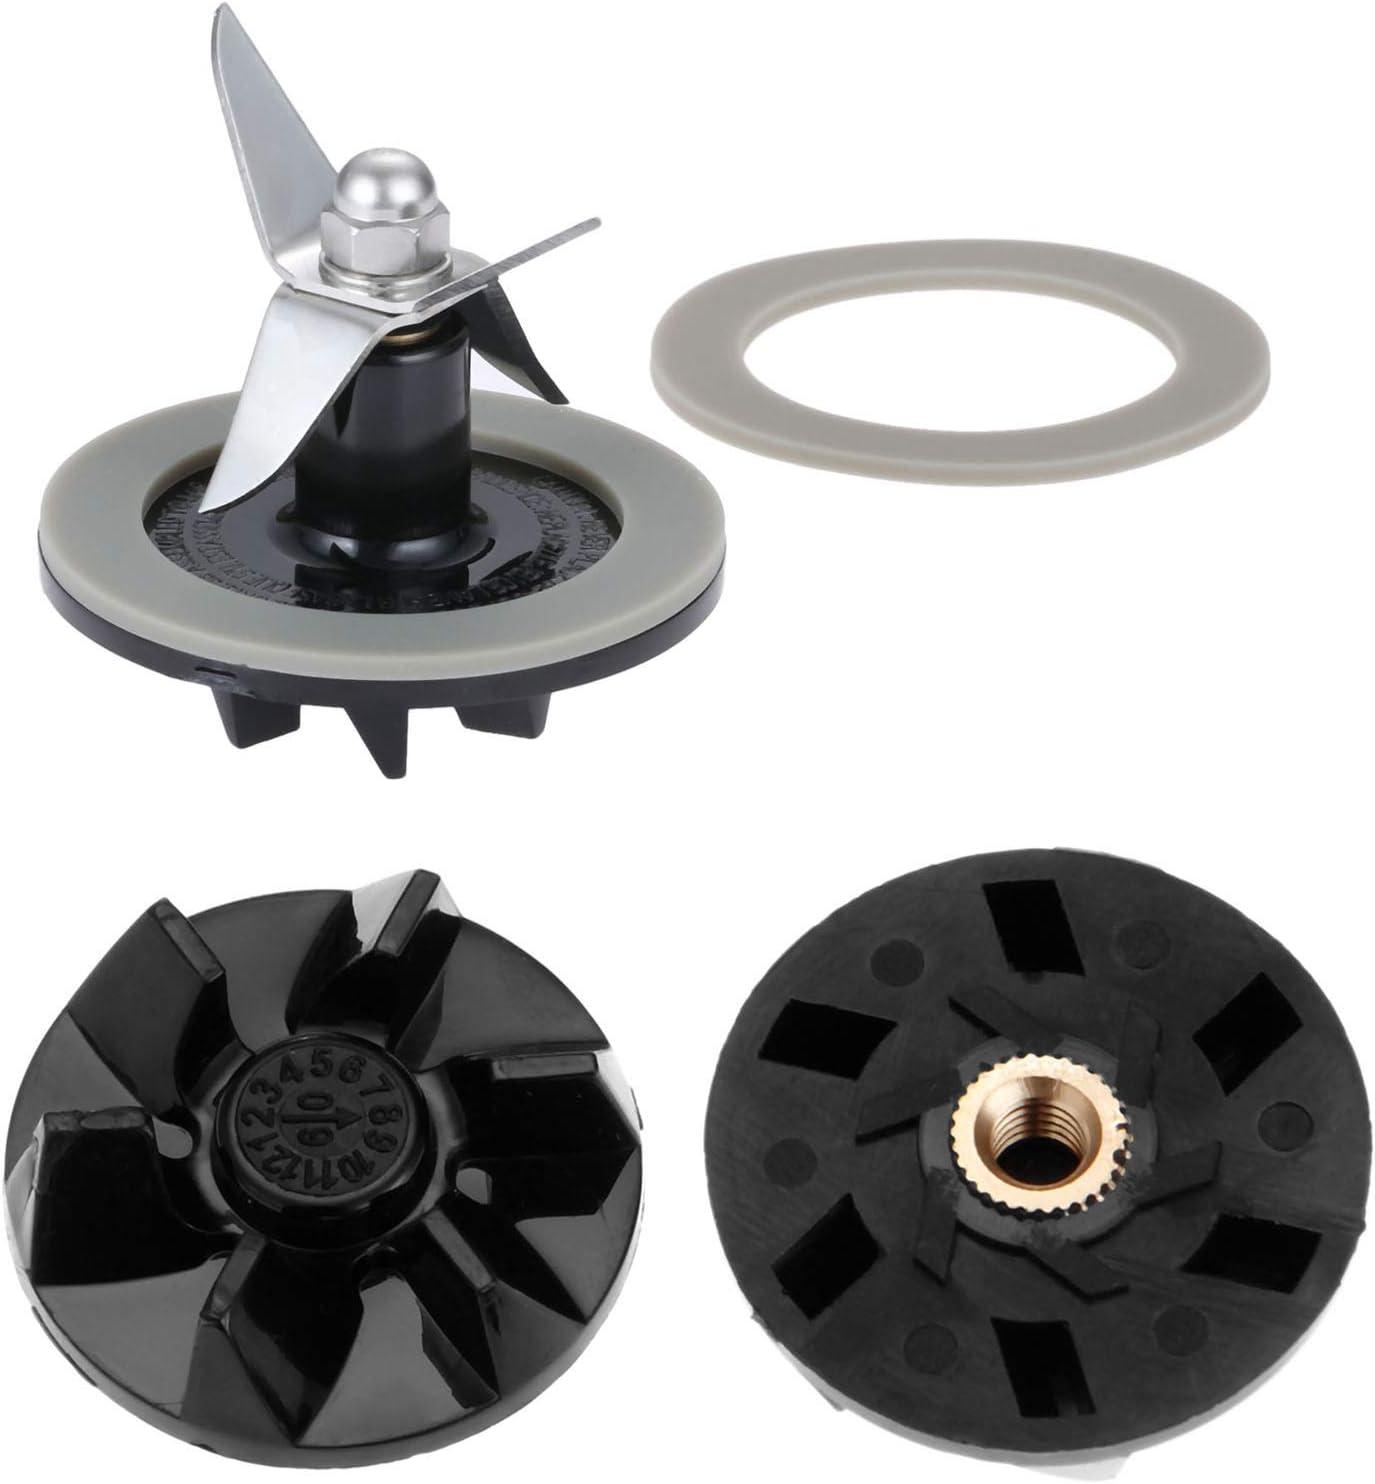 SPB-456-2 Blade Cutter Gasket Rubber Sealing O-ring with SPB7-20TXN Motor Driver Gear Clutch, Replacement for Cuisinart Blenders # BFP703 BFP-703 BFP703B BFP-703CH SPB7 SPB-7BK CB8 CB9 BFP-703